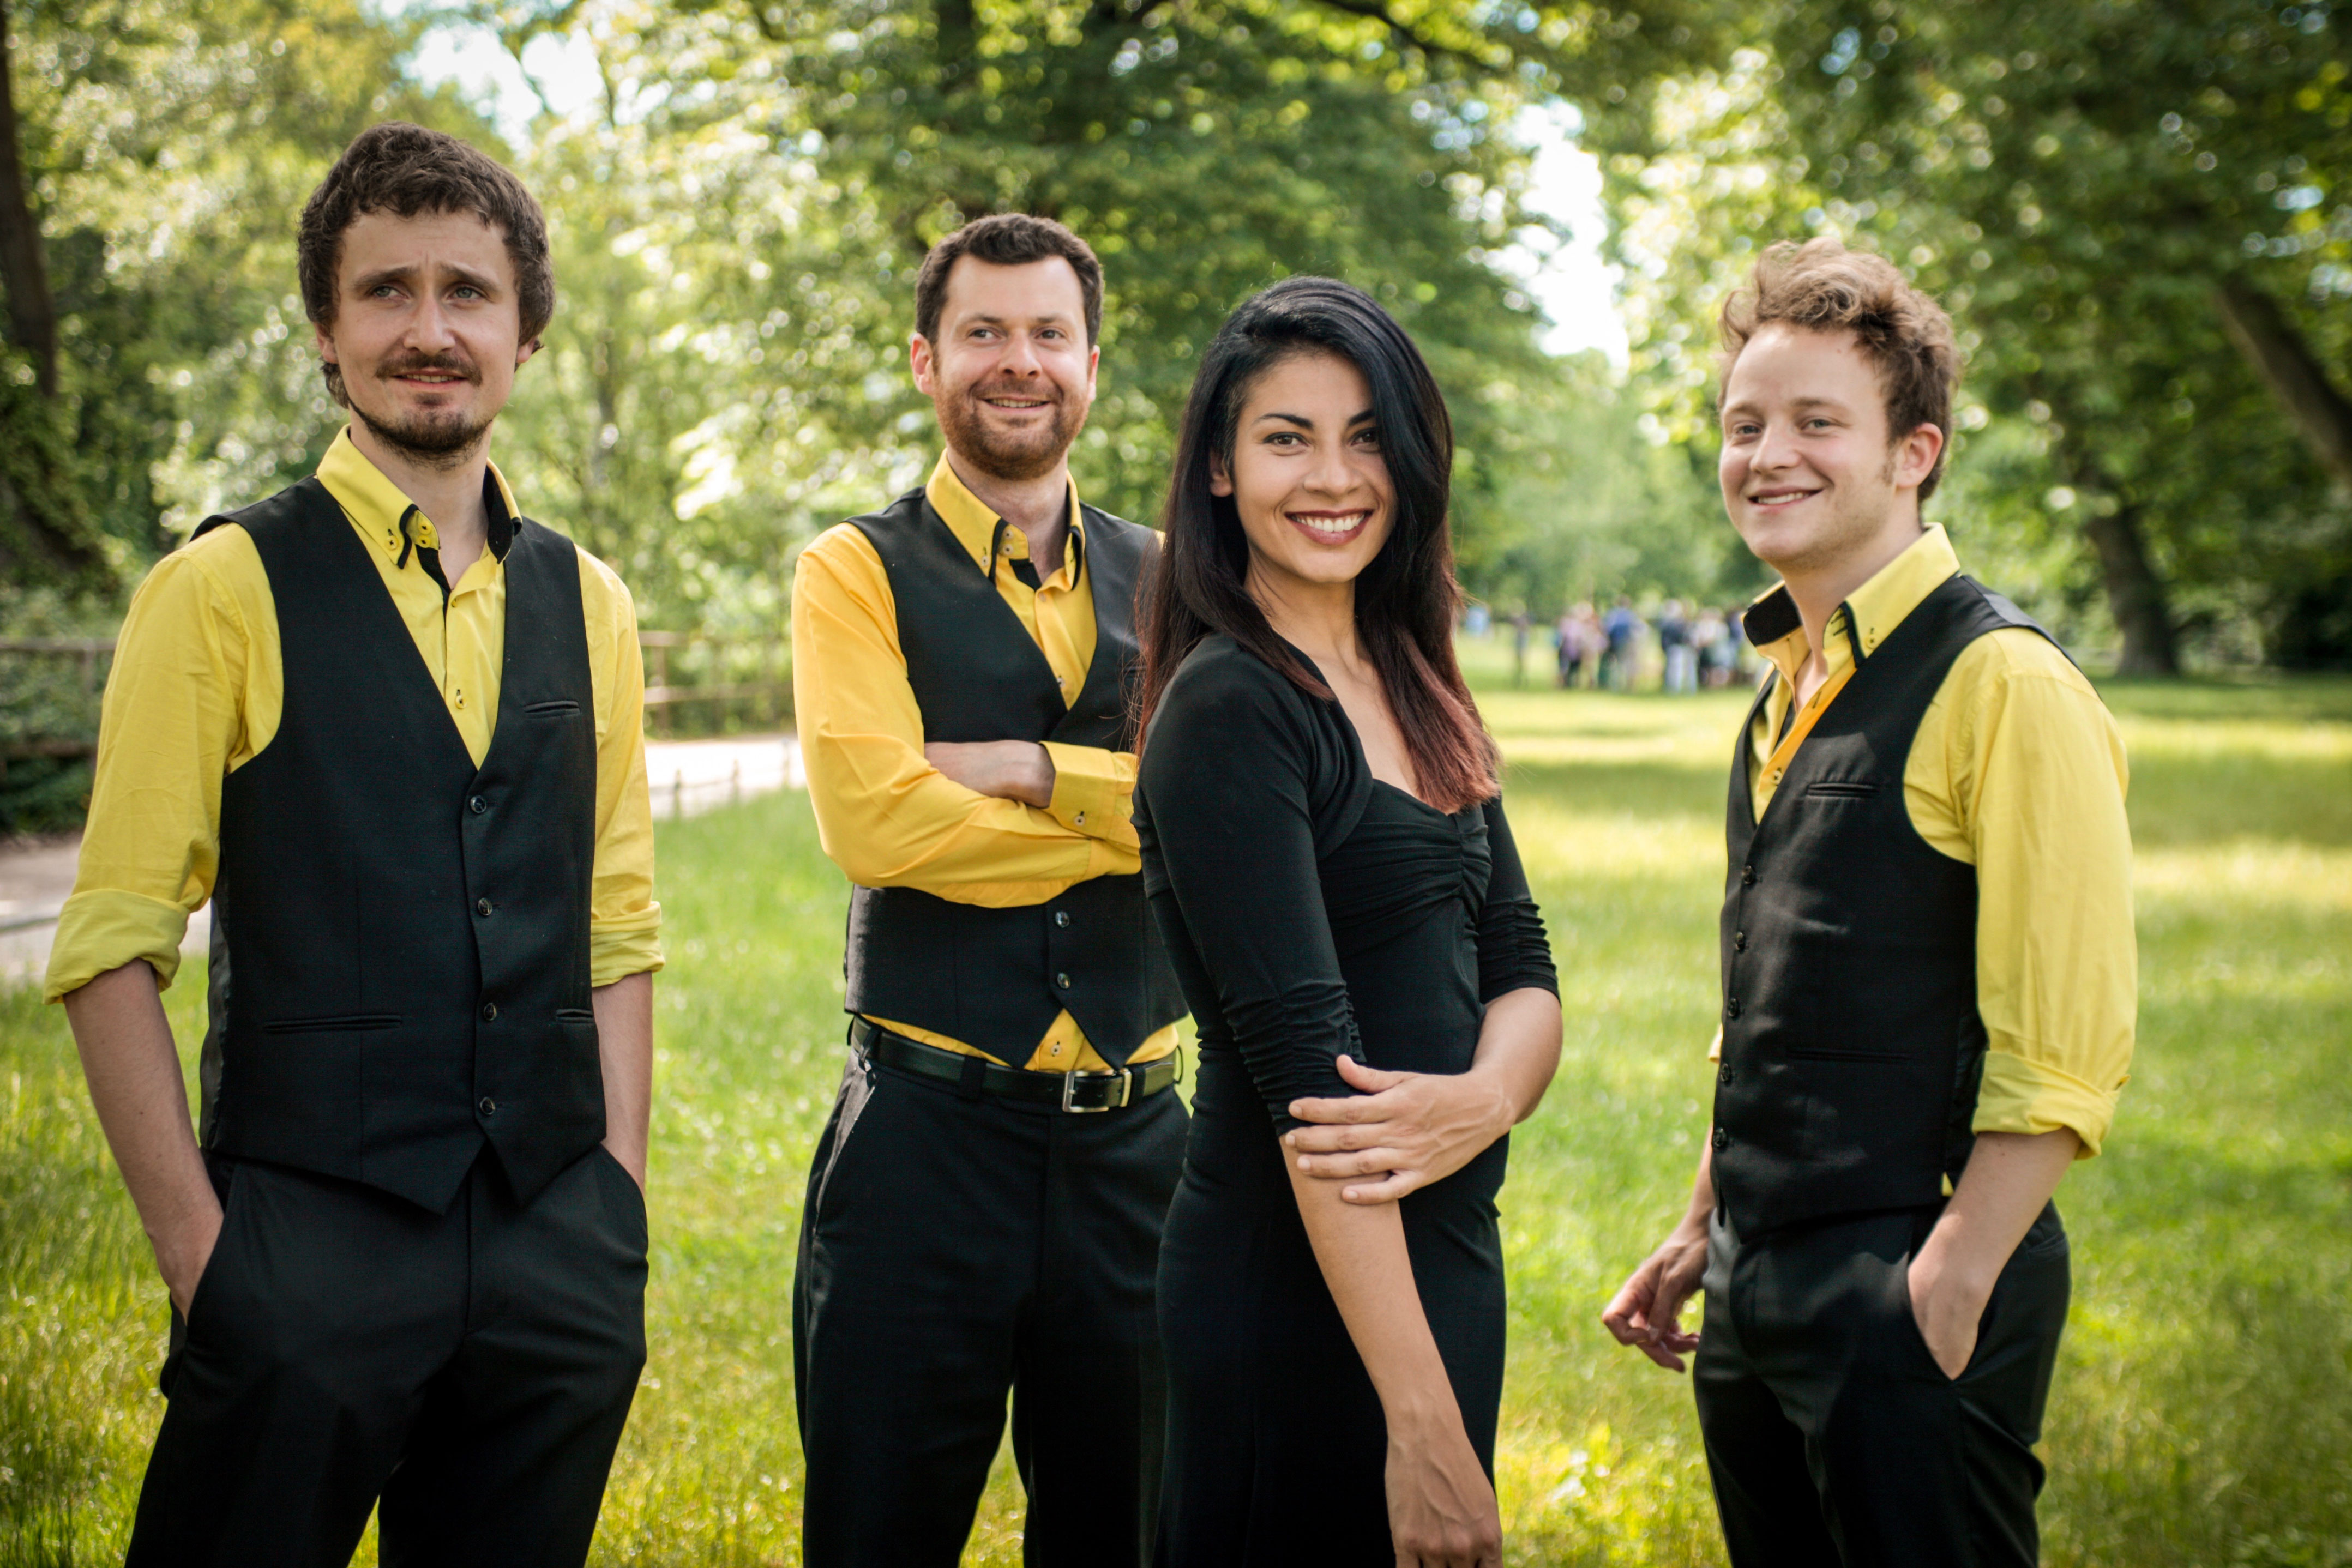 Feuerbach Quartett - Gruppenfoto